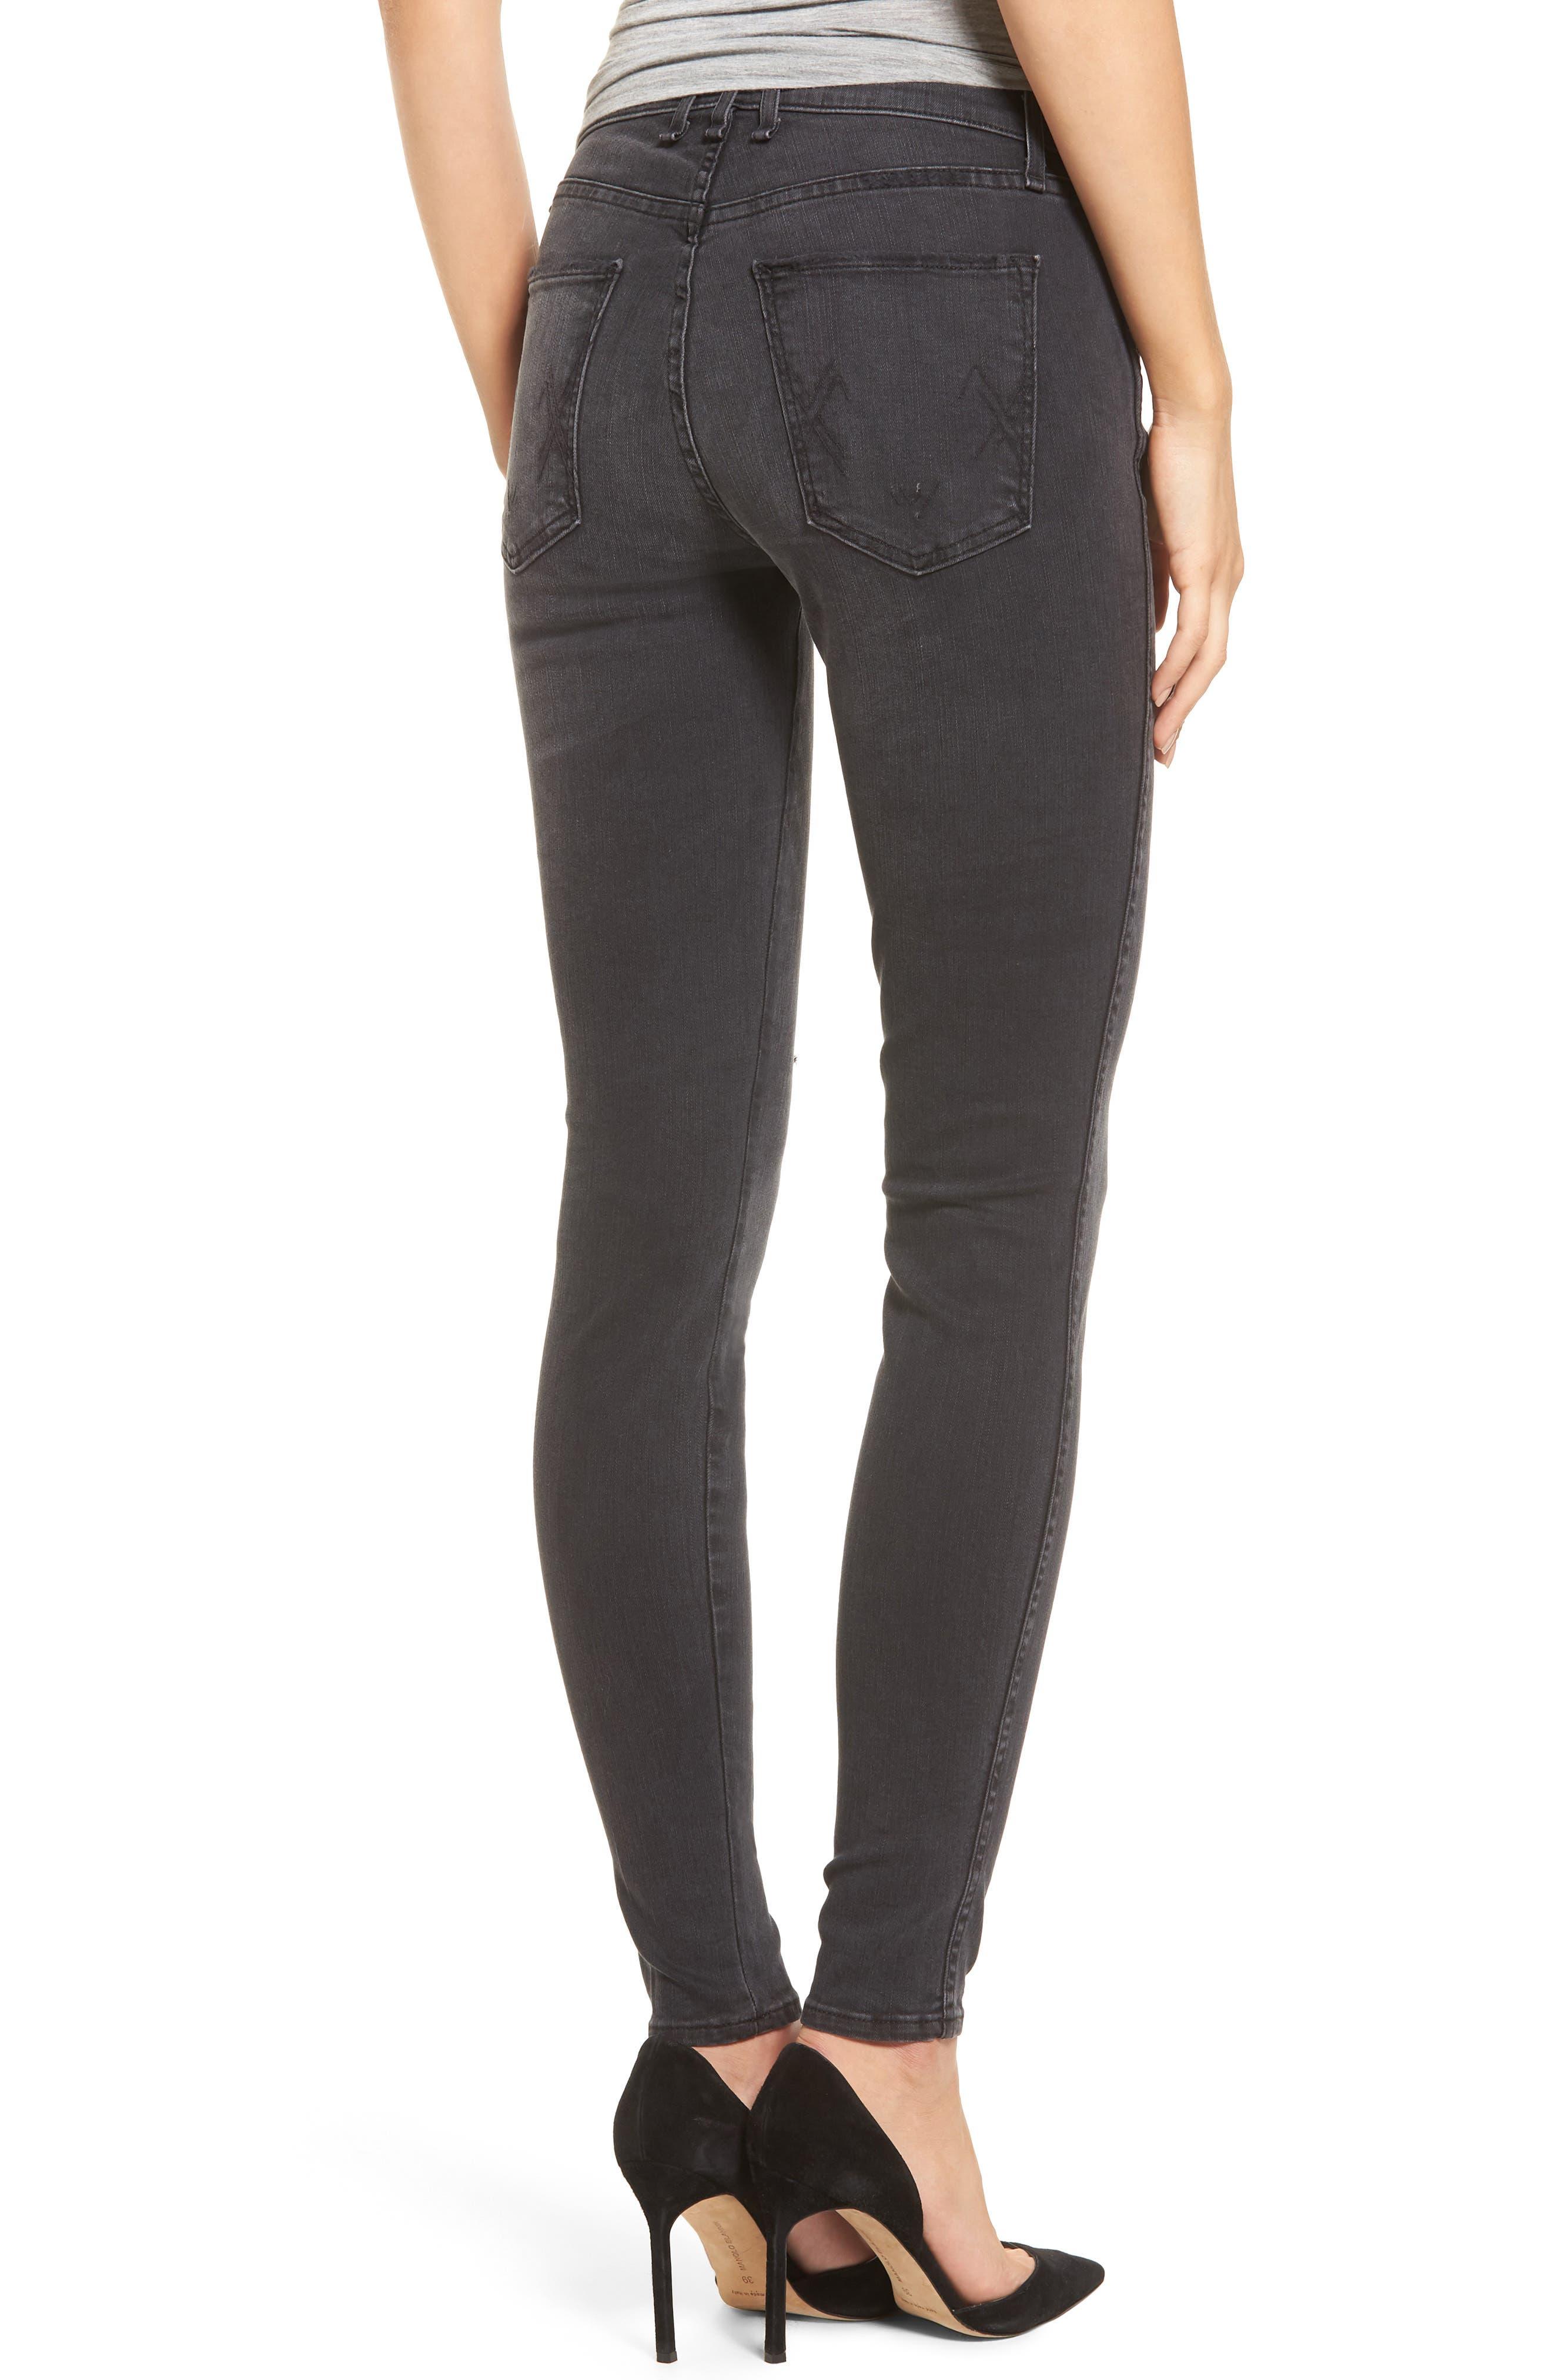 Newton Skinny Jeans,                             Alternate thumbnail 2, color,                             011